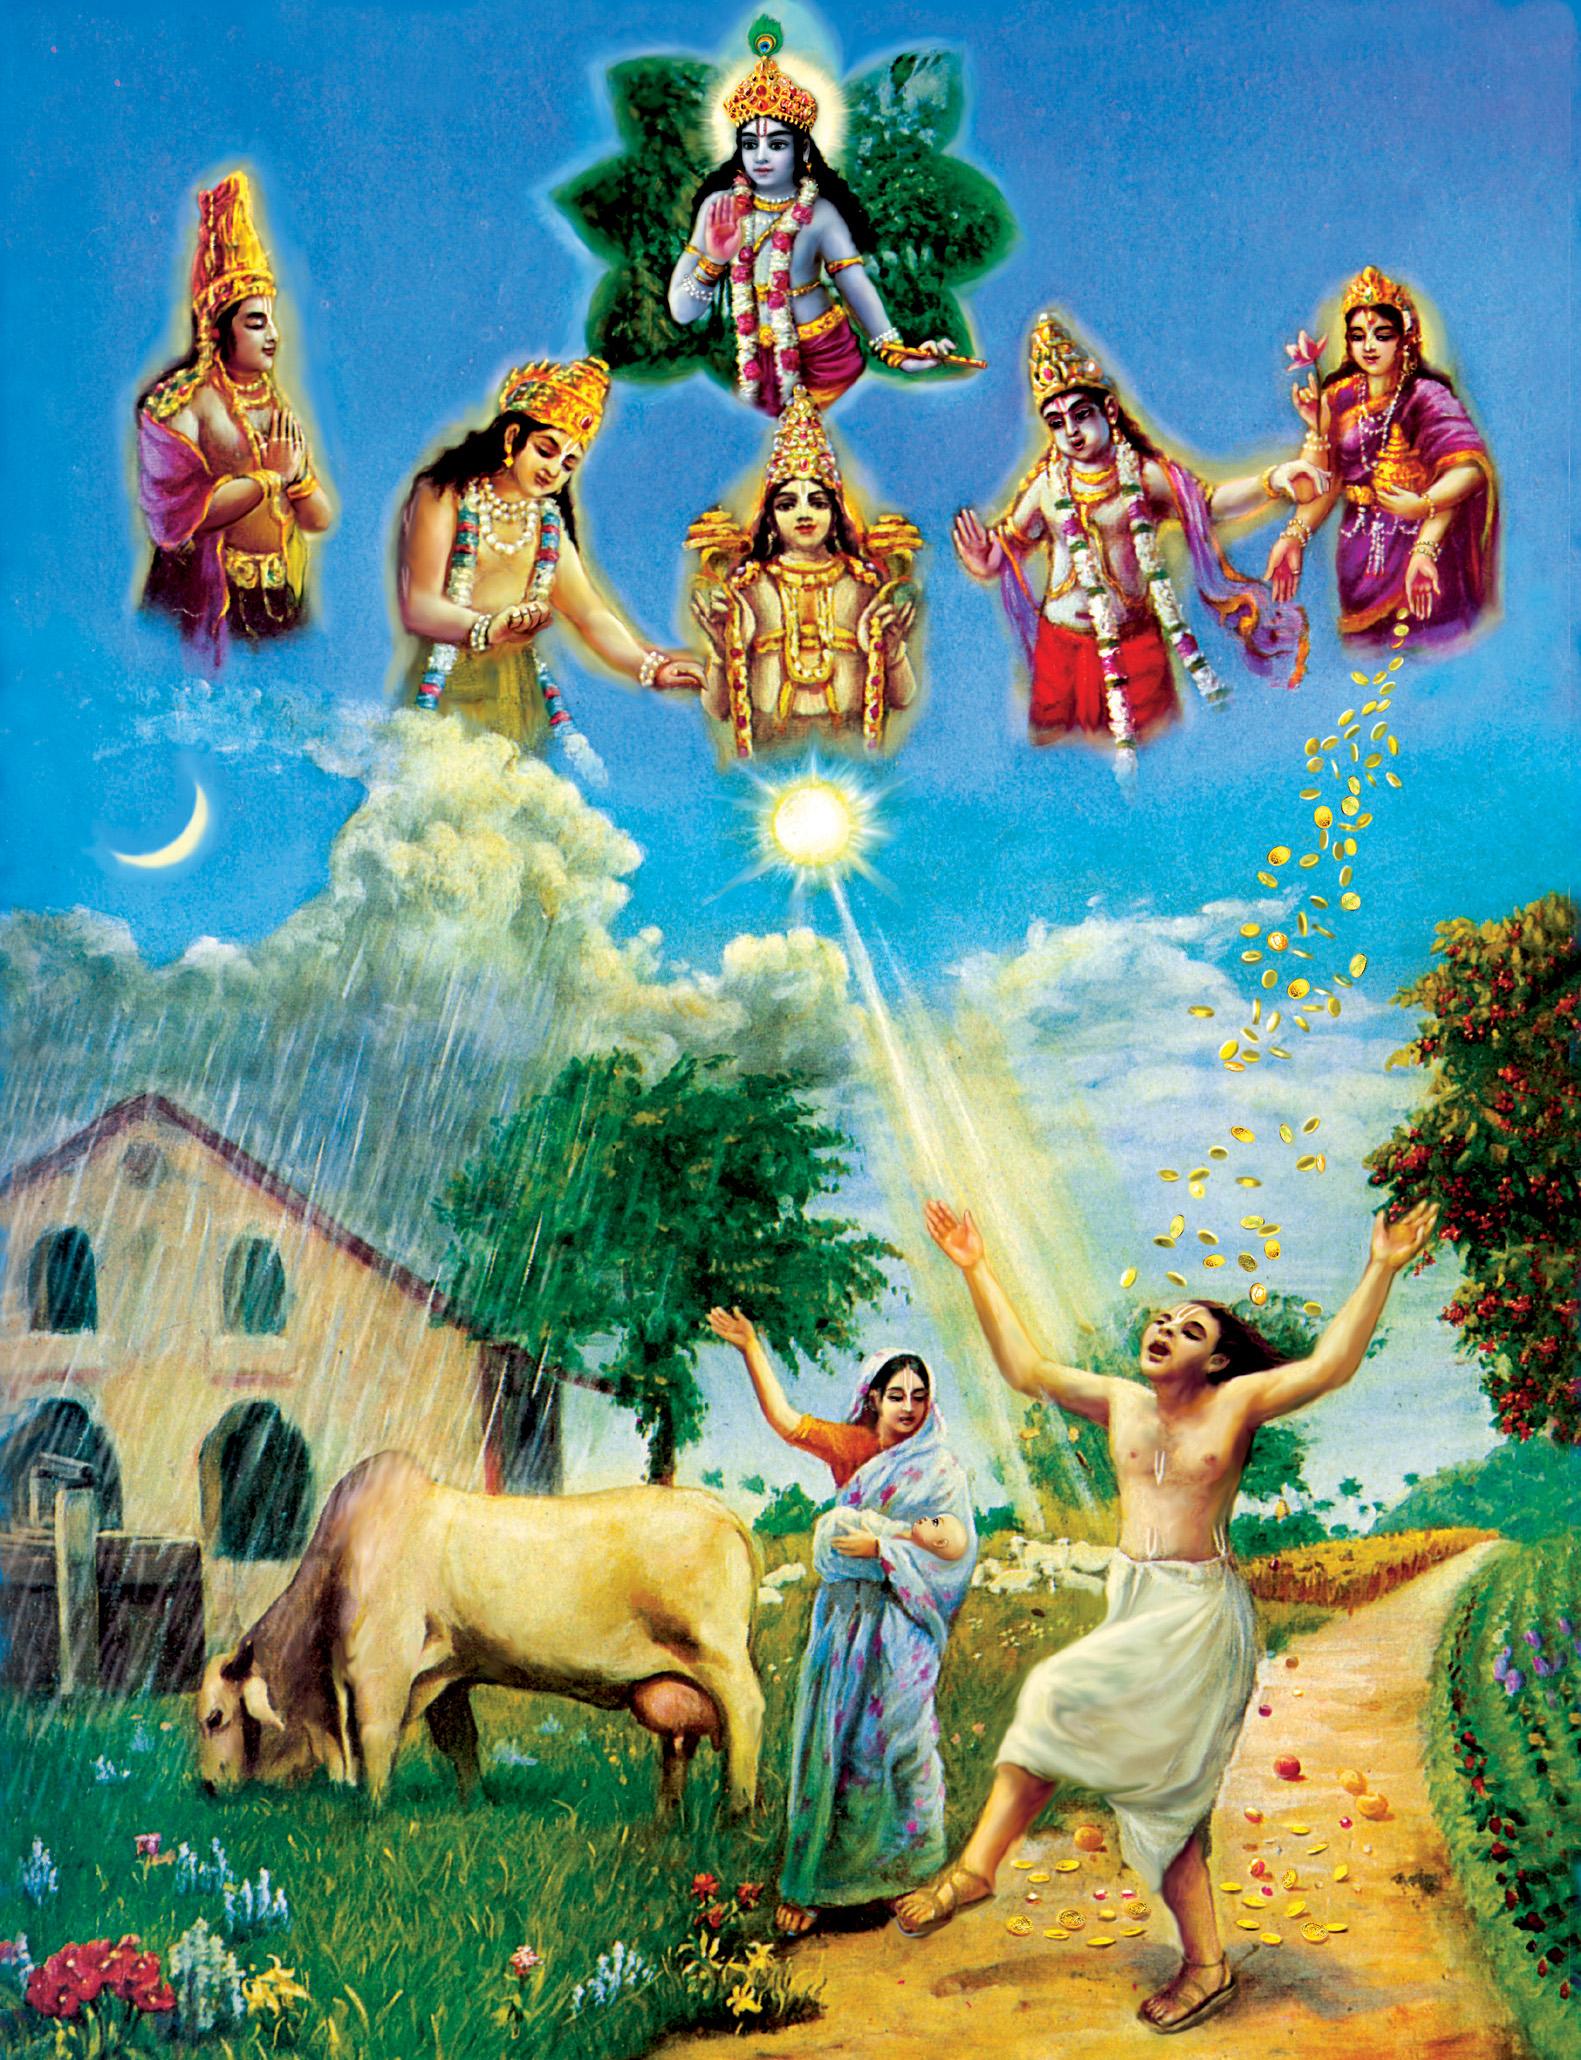 Worshiping Demigods Works But    | Krishna org